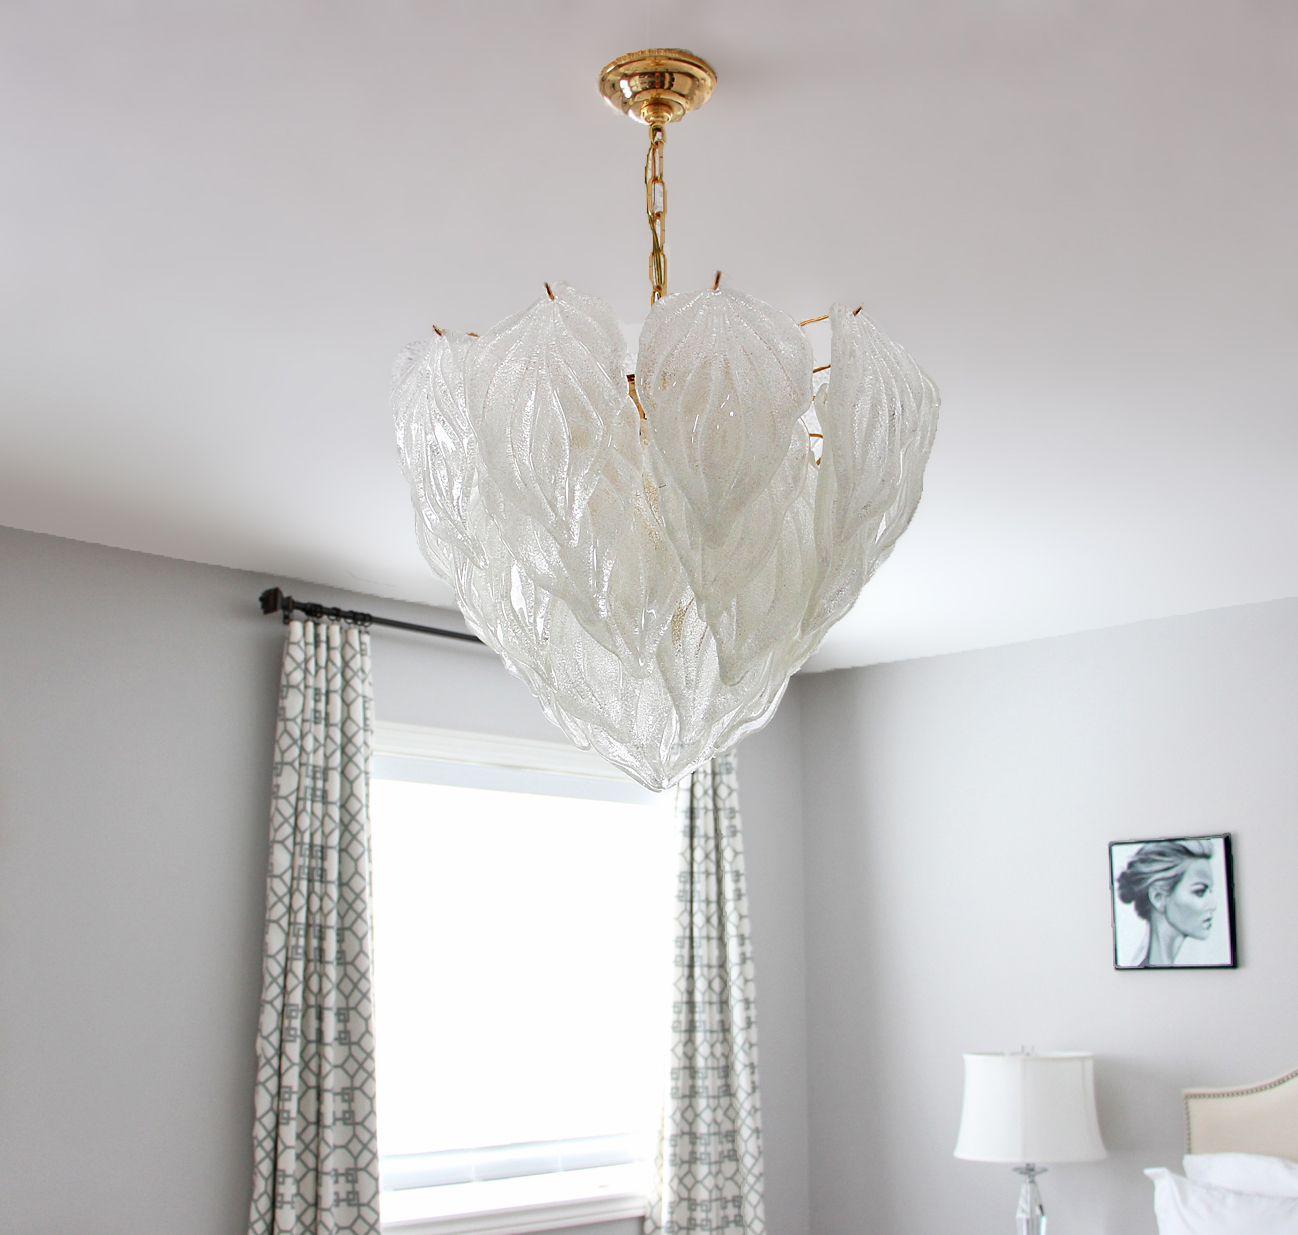 Am Dolce Vita Vintage Murano Chandelier Update Novaresi Glass Leaf